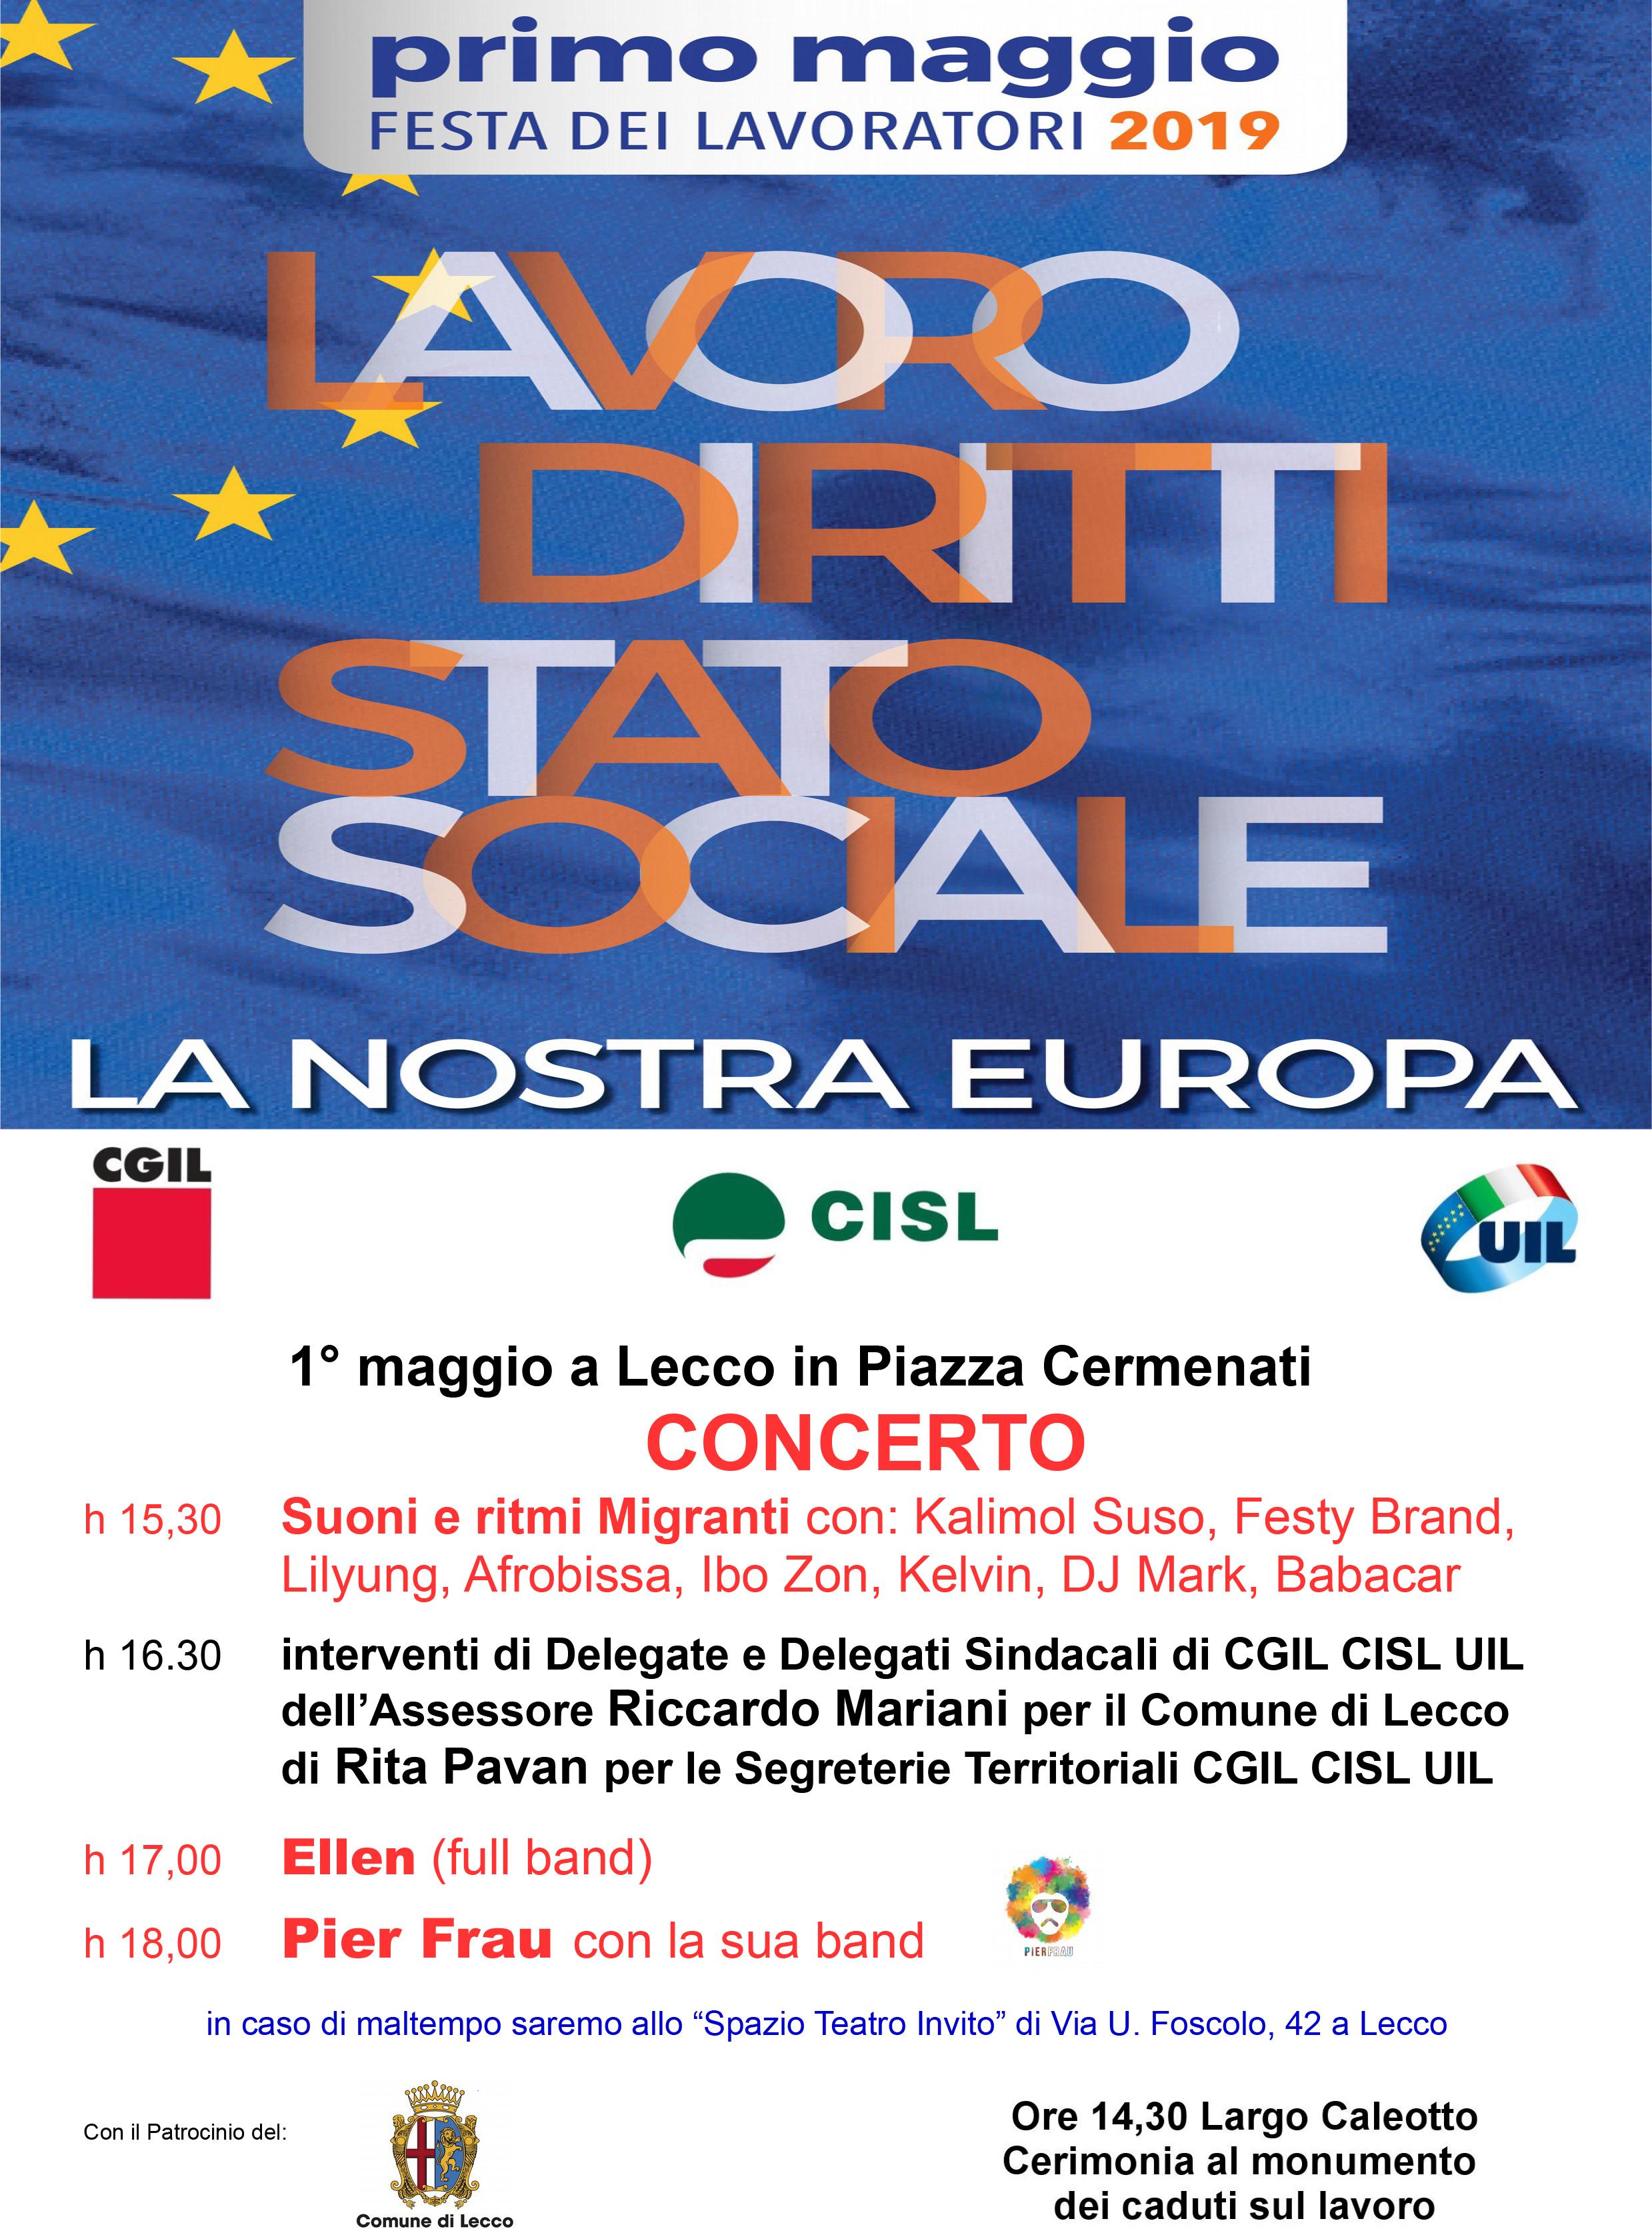 Manifesto Concerto 1° maggio 2019 Lecco Ellen Pier Frau-2